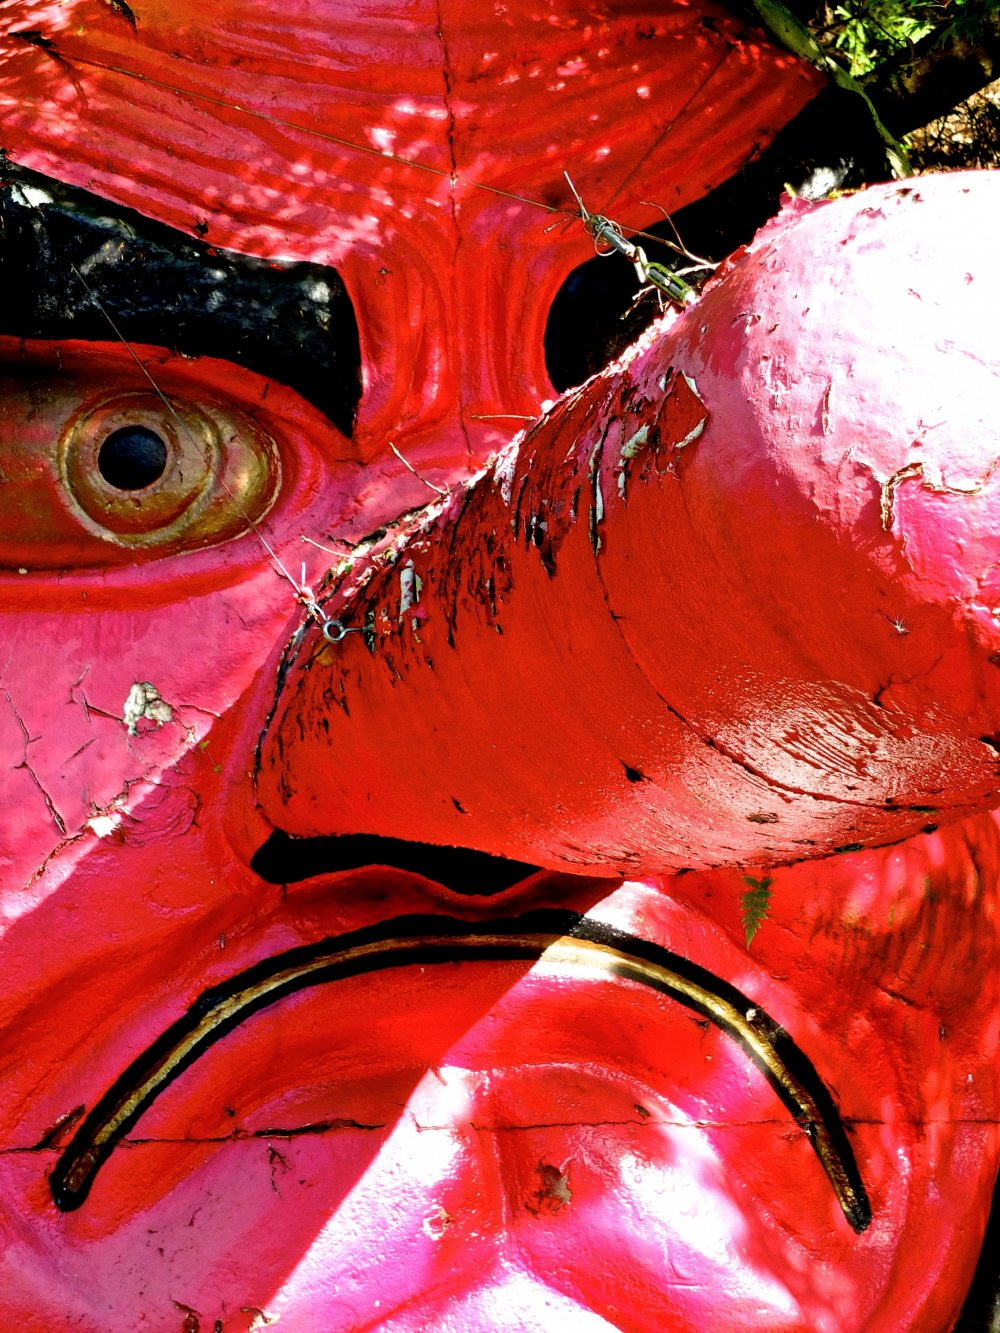 Red-nosed Tengu goblin